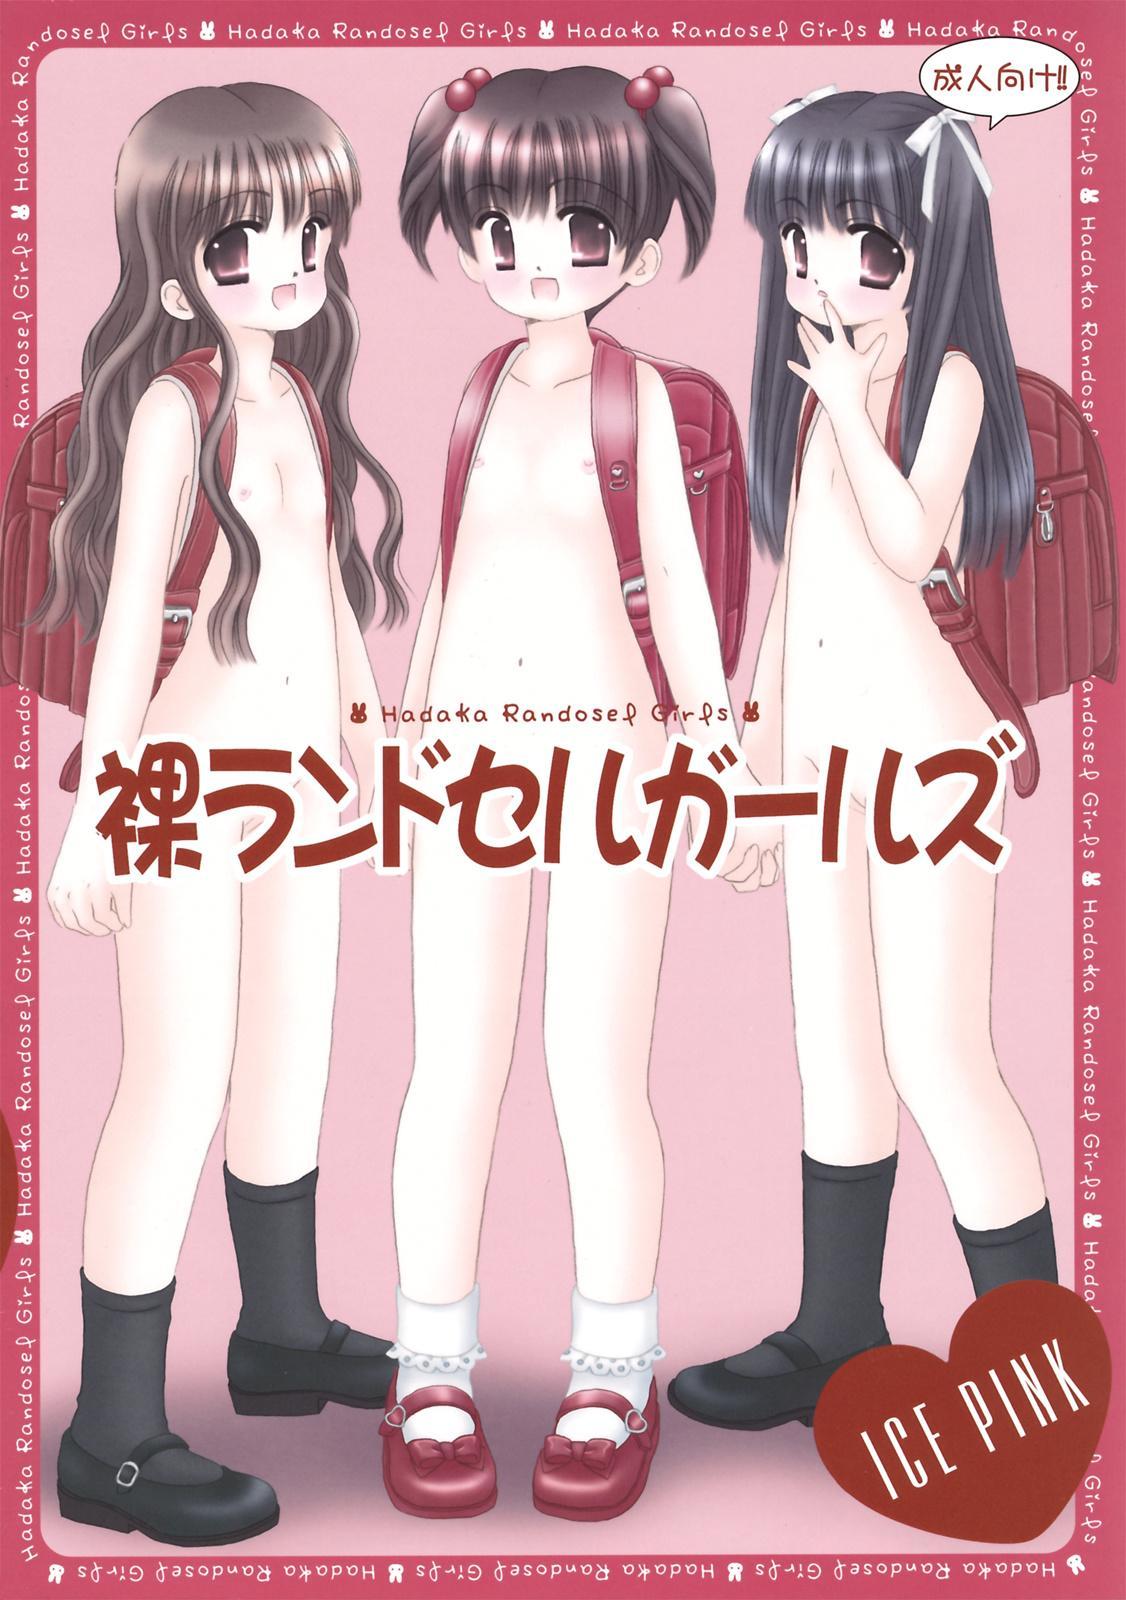 Hadaka Randosel Girls 25